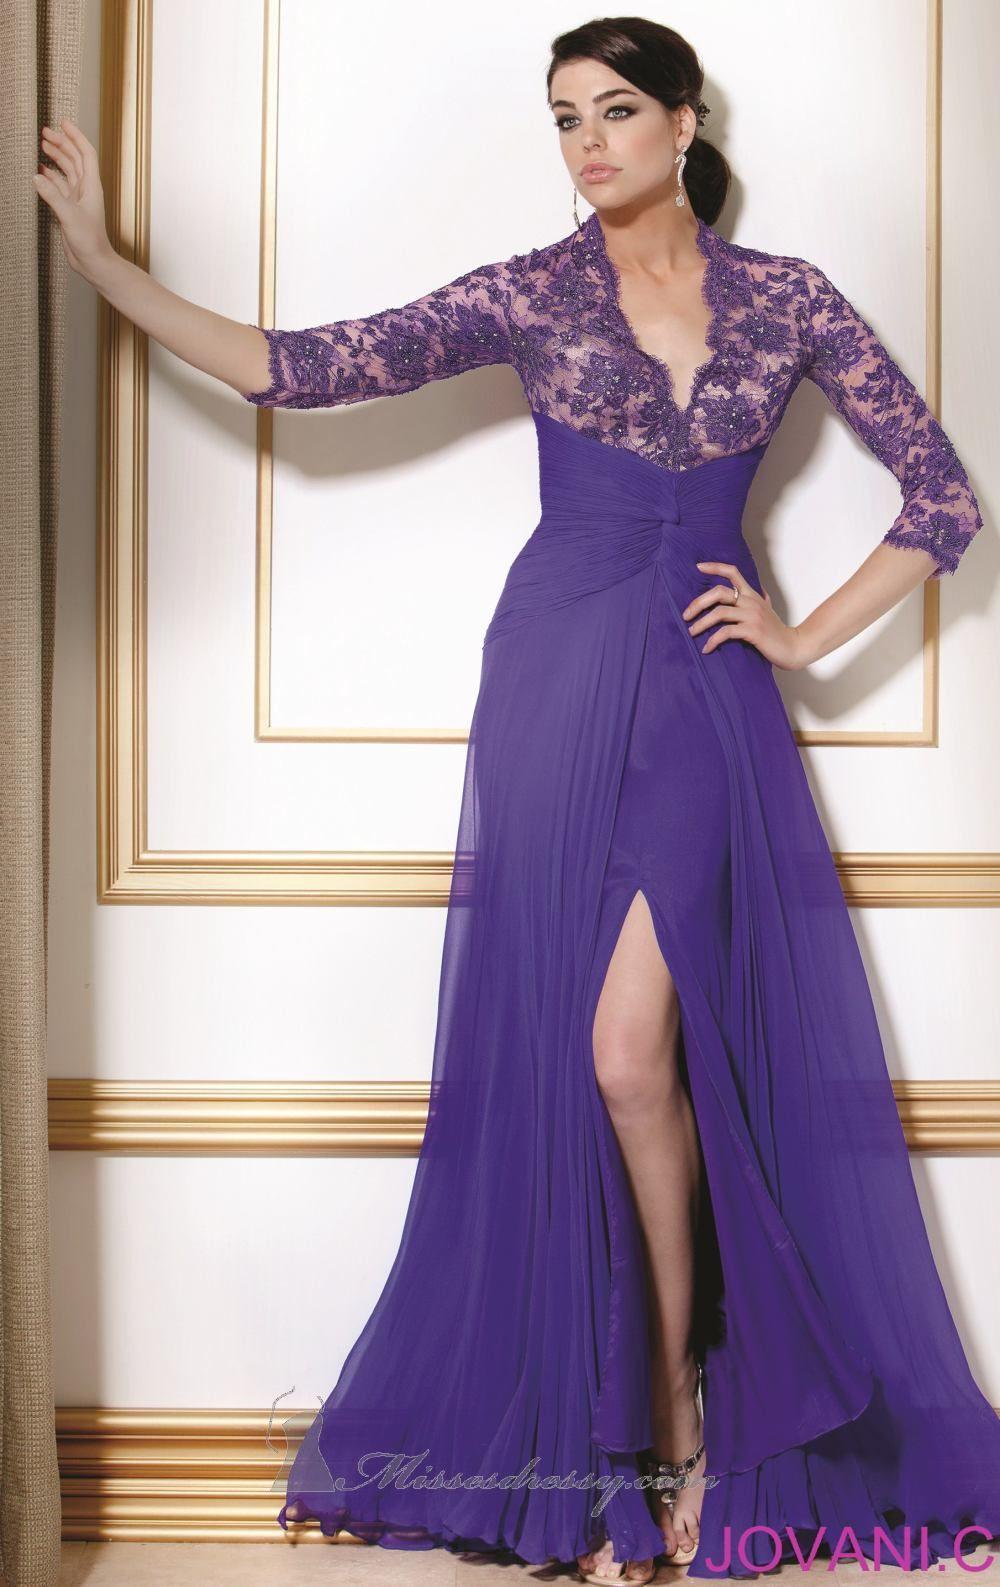 Lujo Dresses.co.uk Boda Ideas Ornamento Elaboración Festooning ...